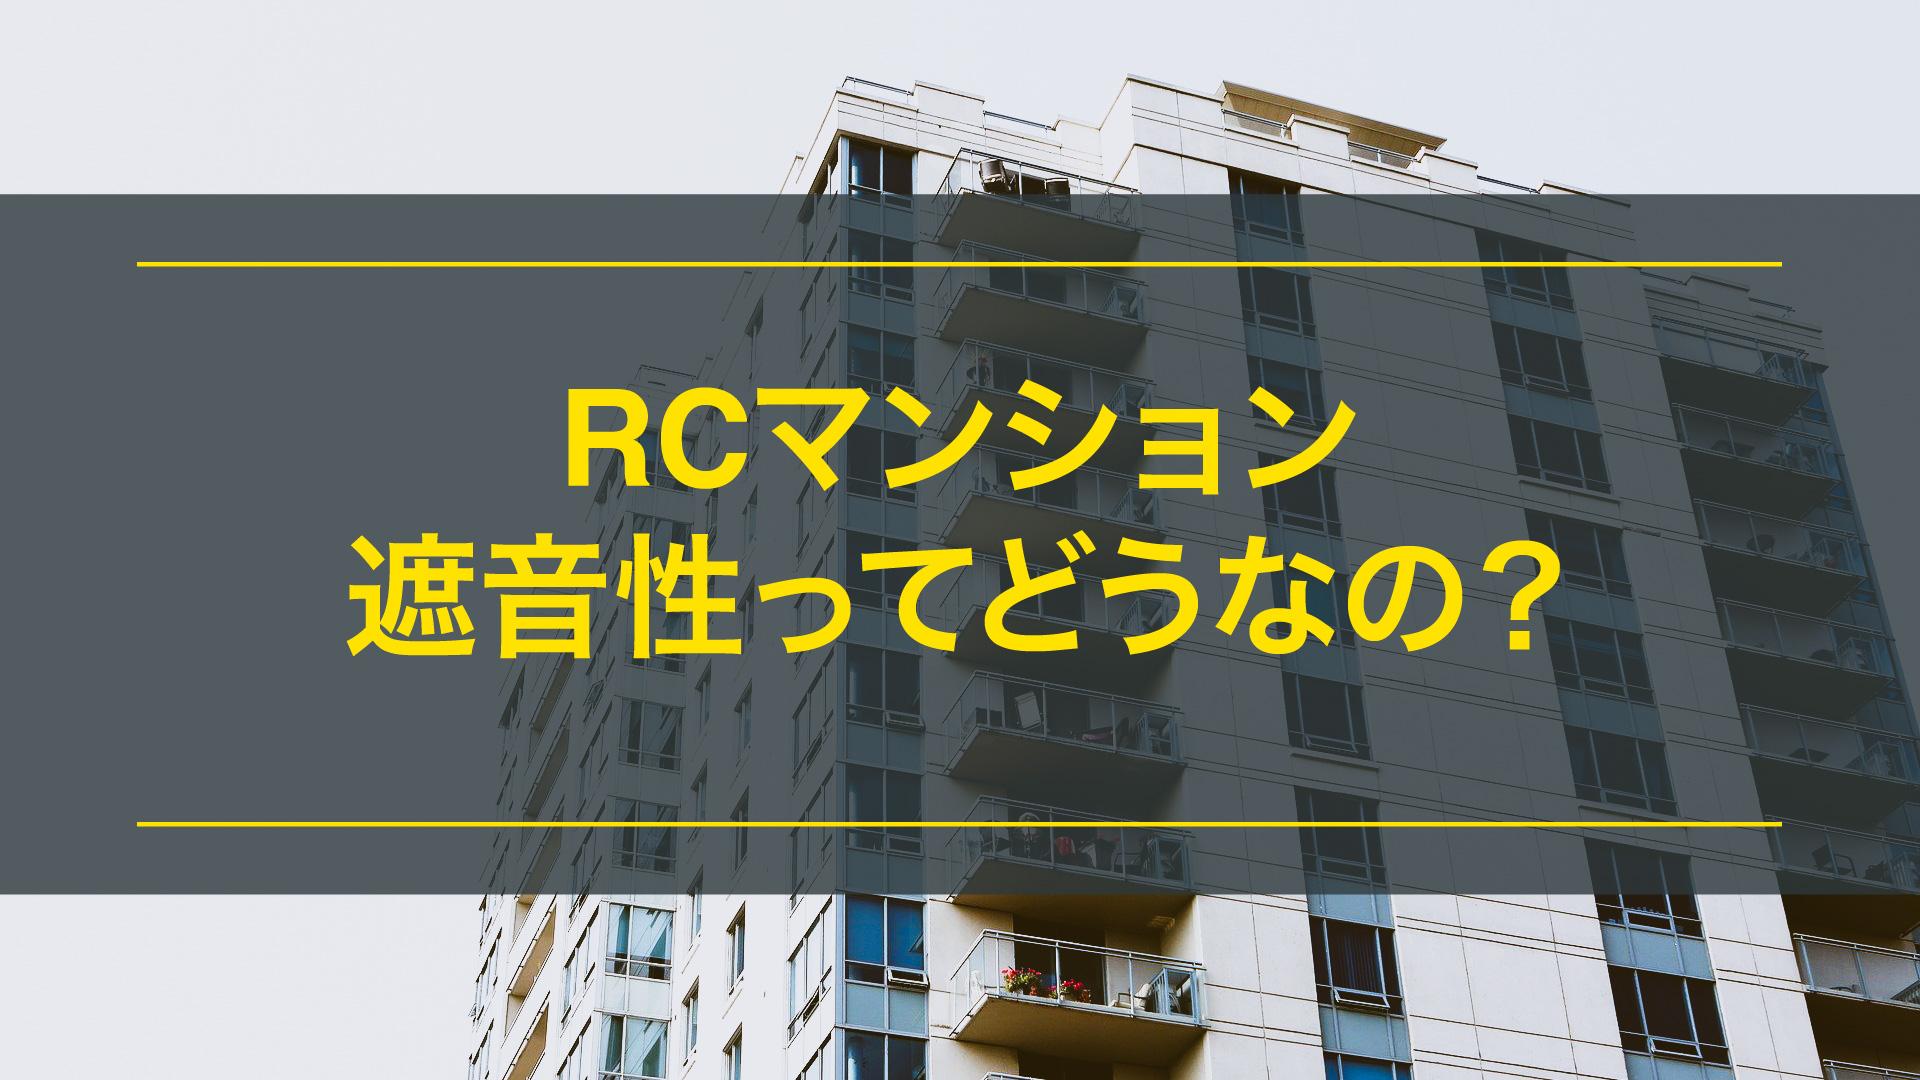 RC mansion noise